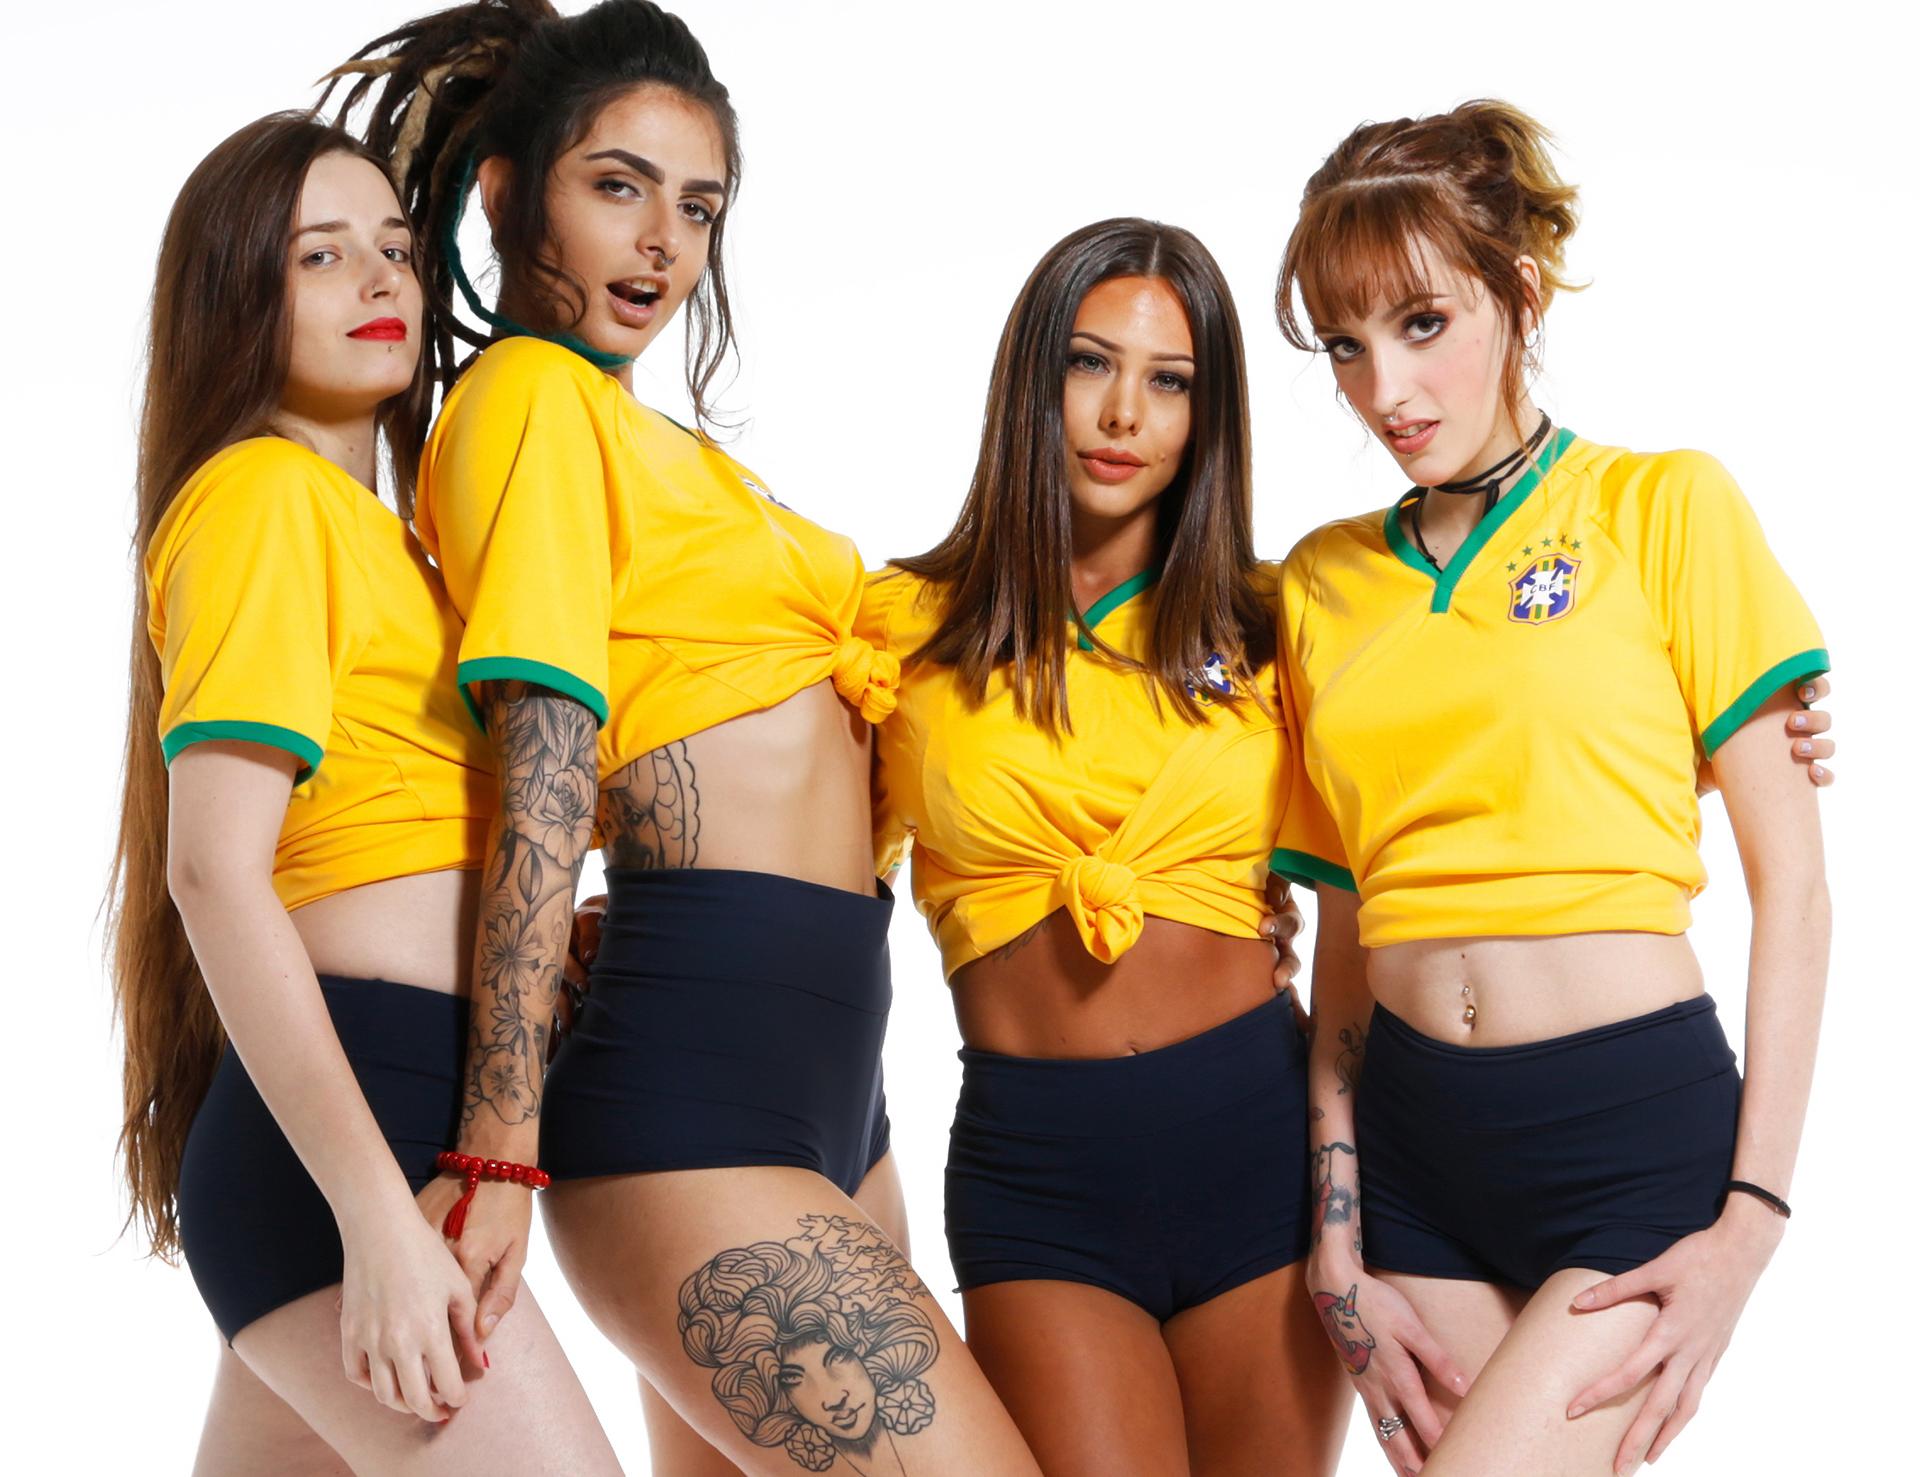 camgirls que torcem para o Brasil